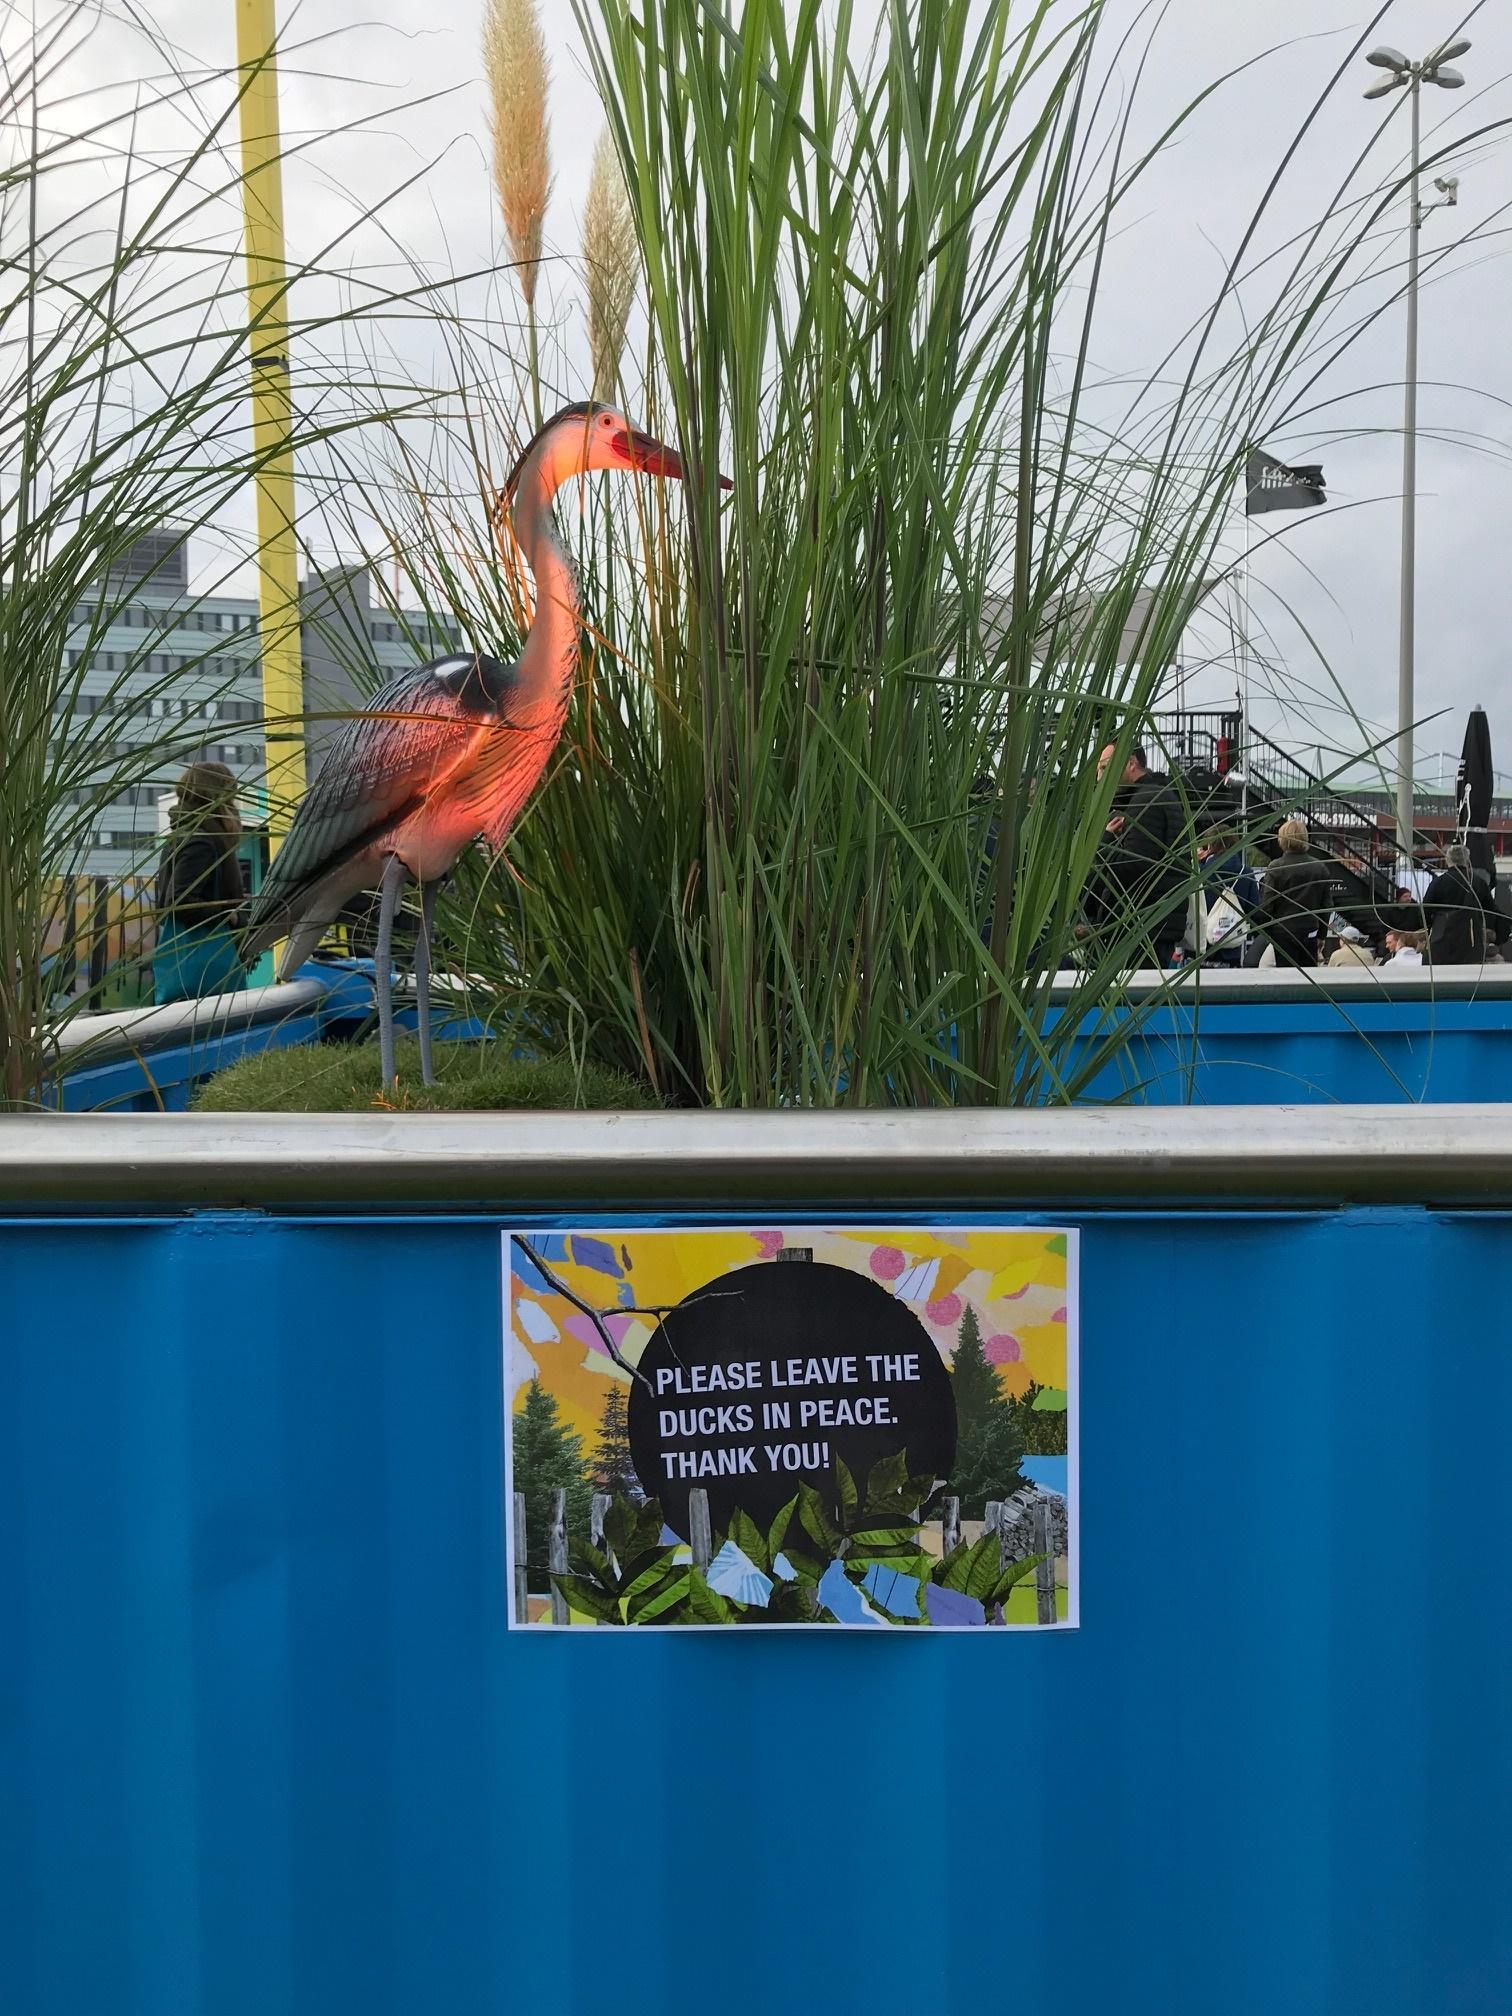 Gut bewachte Enten beim Reeperbahn Festival, Festival Village, Heiligengeistfeld.